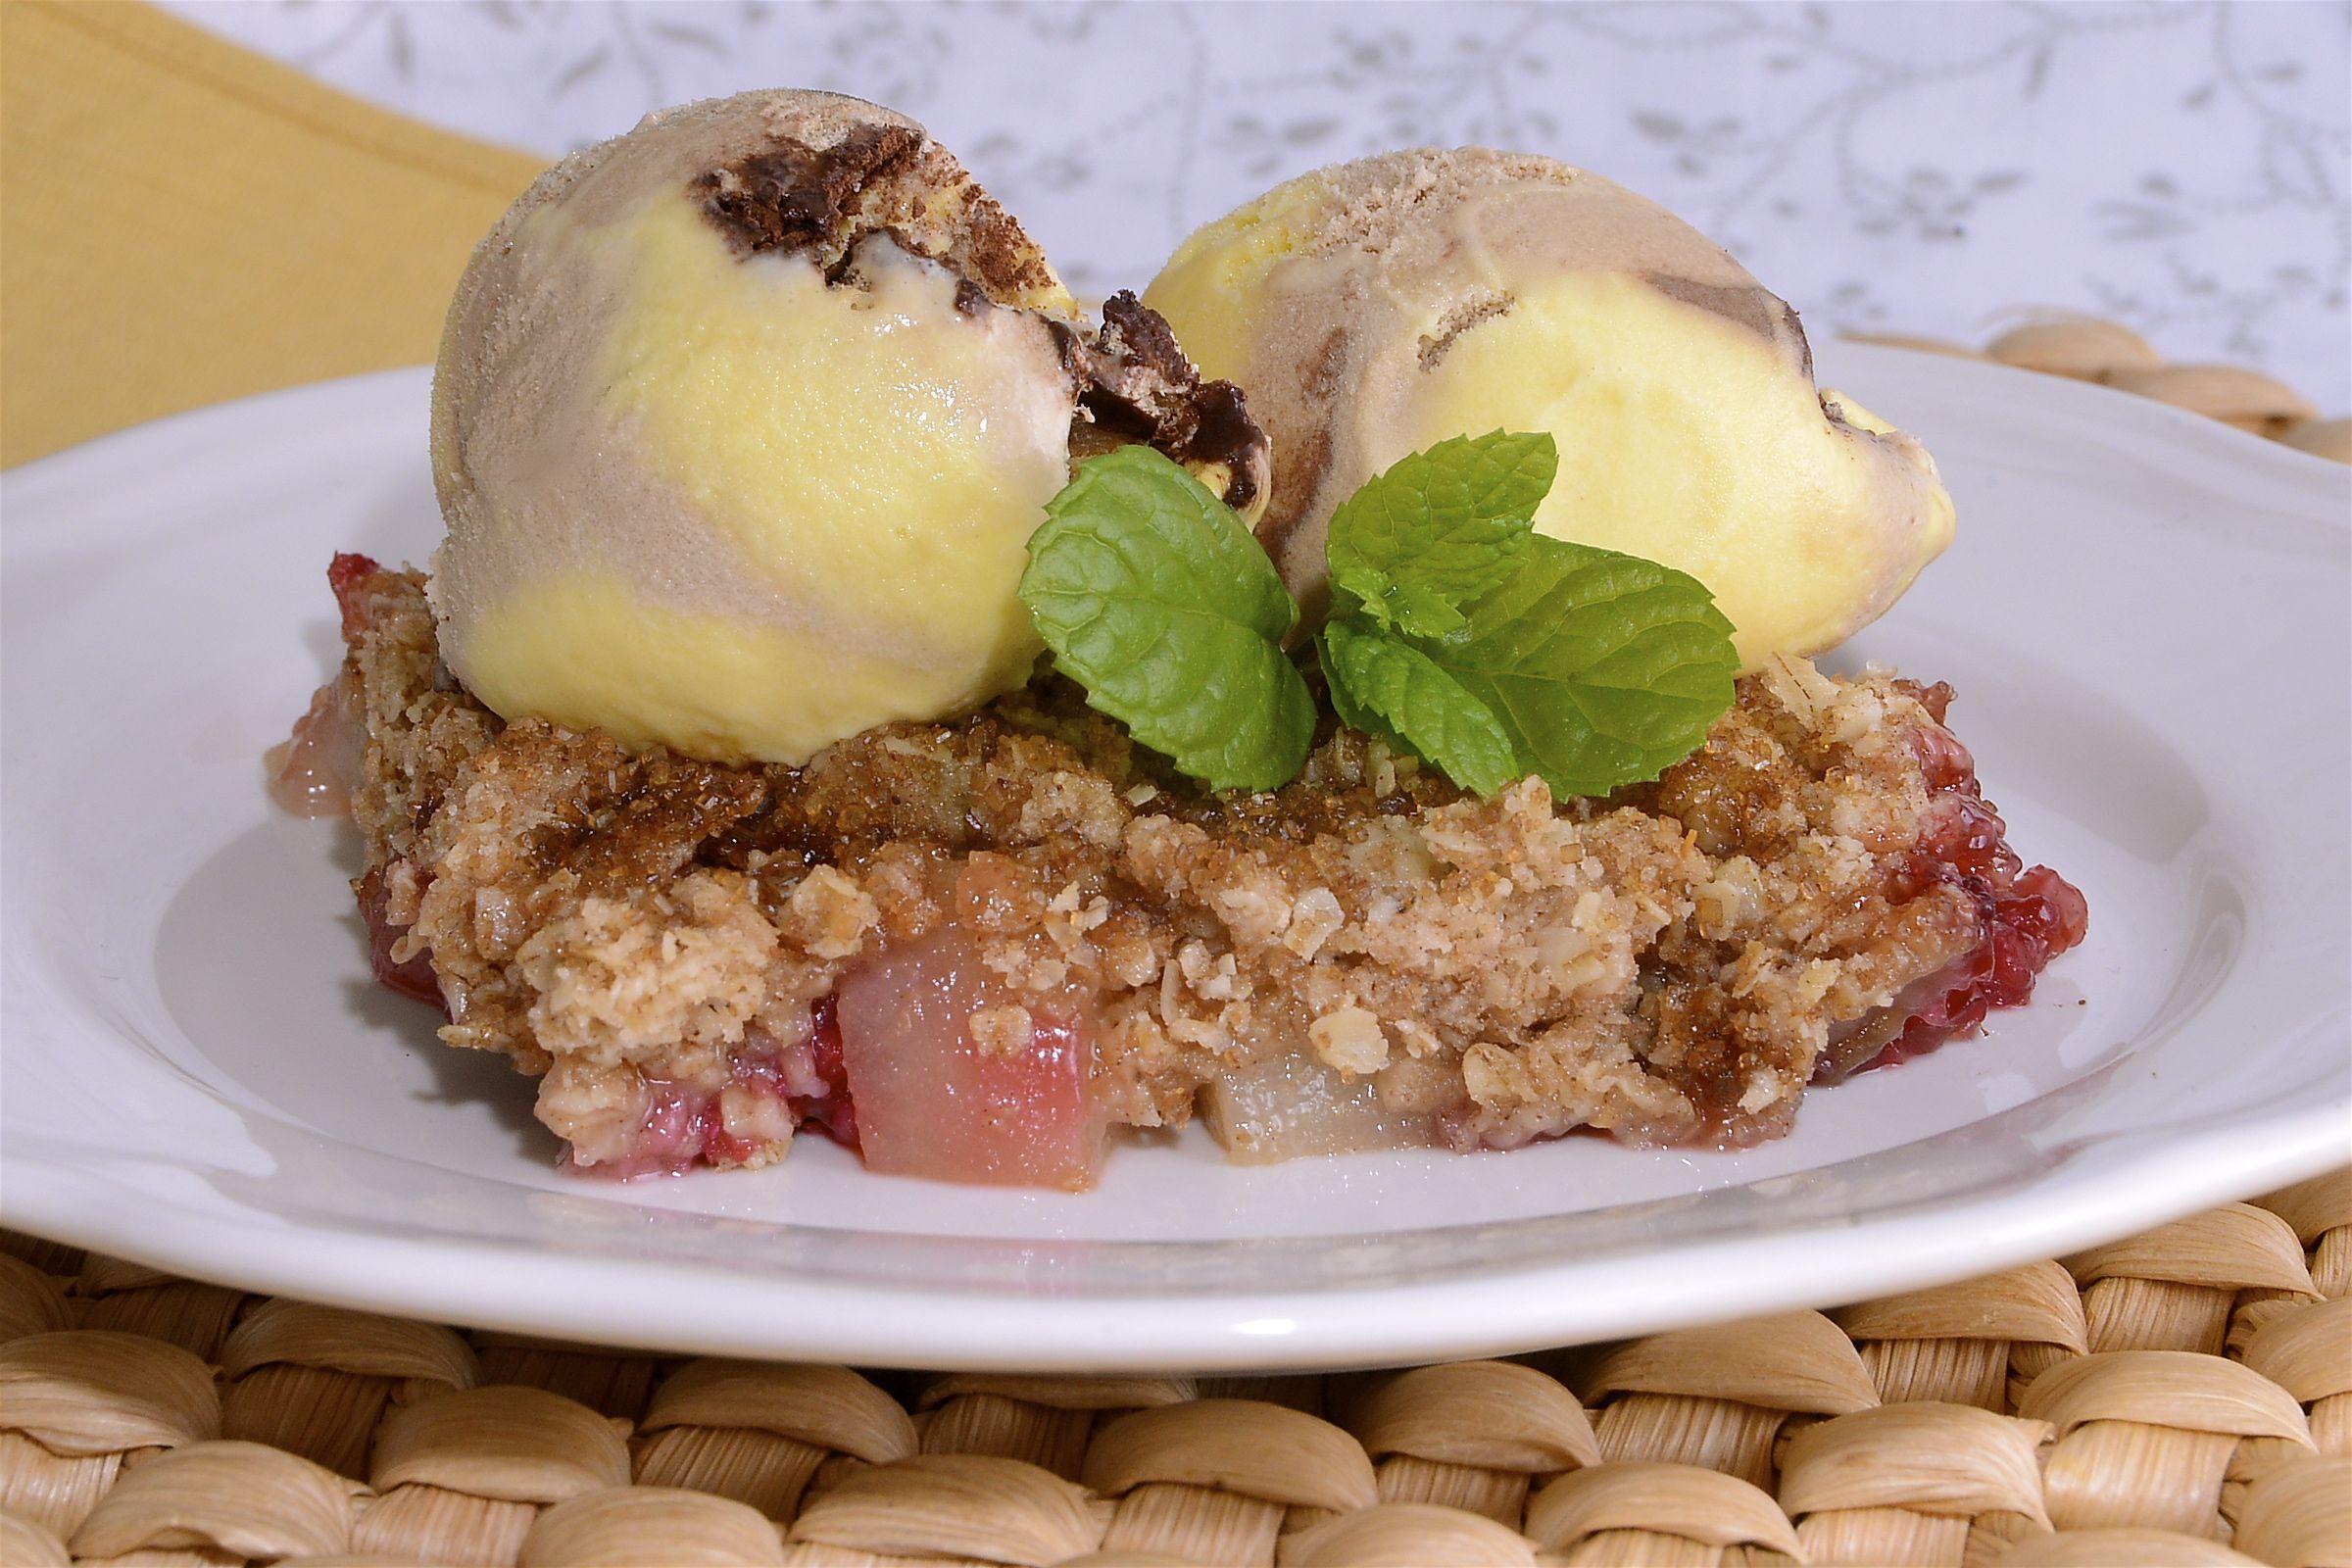 rectas faciles #postres #flanes #recetas de postres - http://misrecetasdeflanes.blogspot.com/